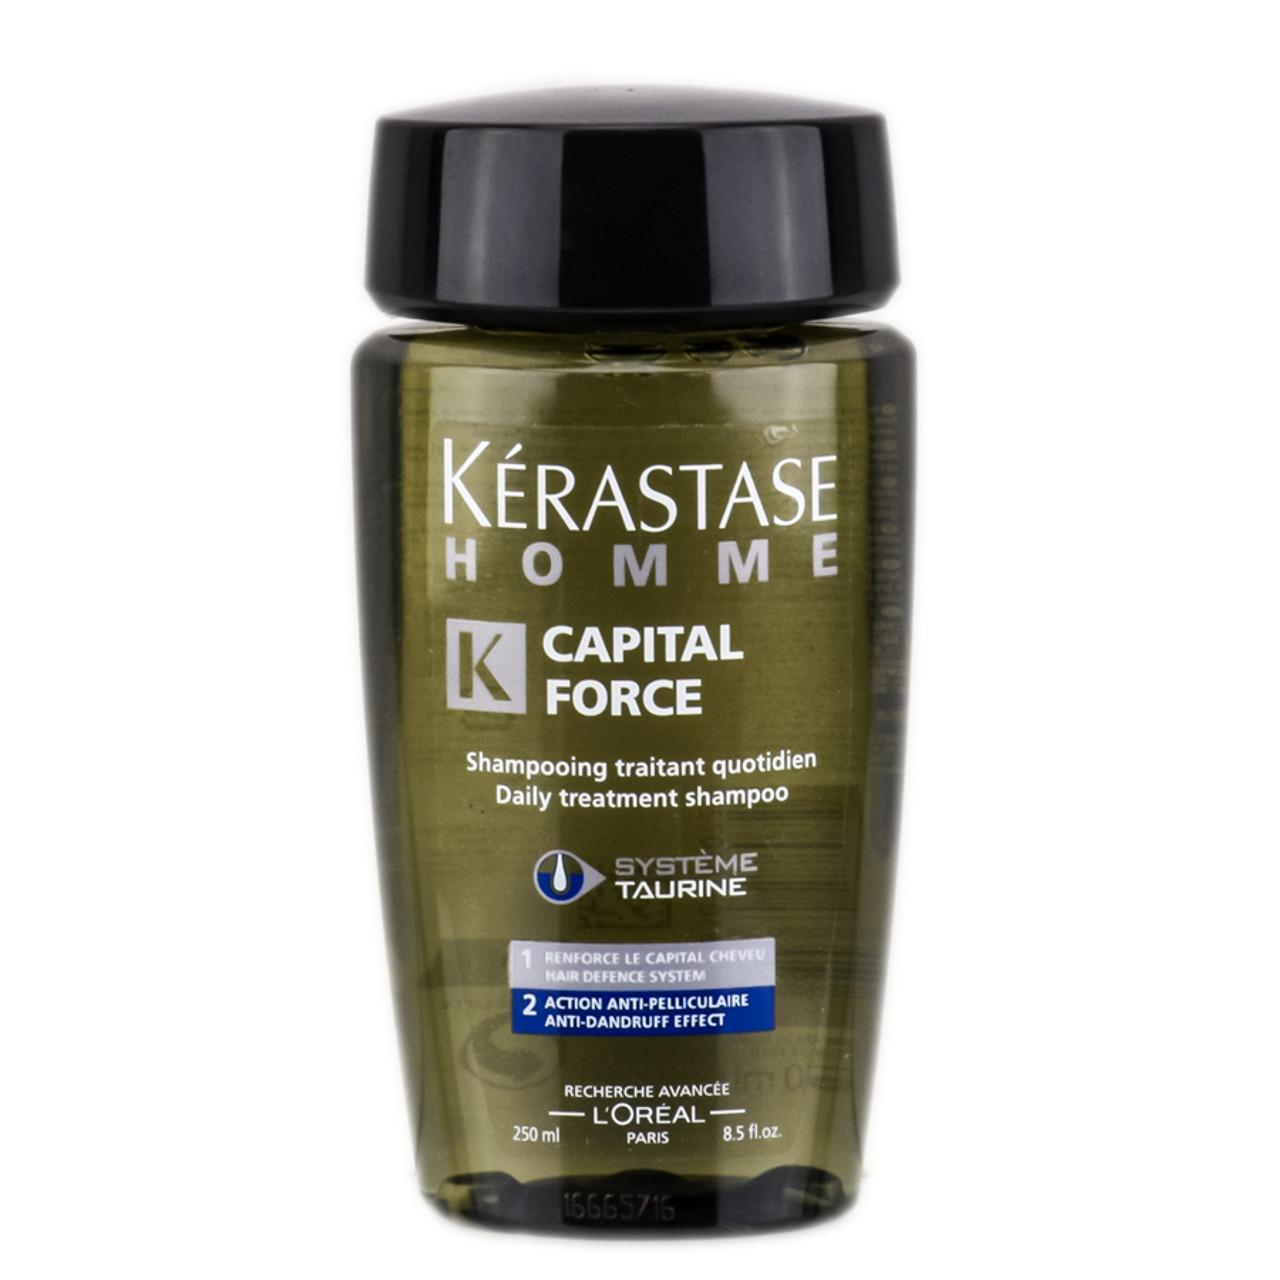 Kerastase homme capital force daily treatment shampoo anti dandruff effect - Kerastase salon treatment ...